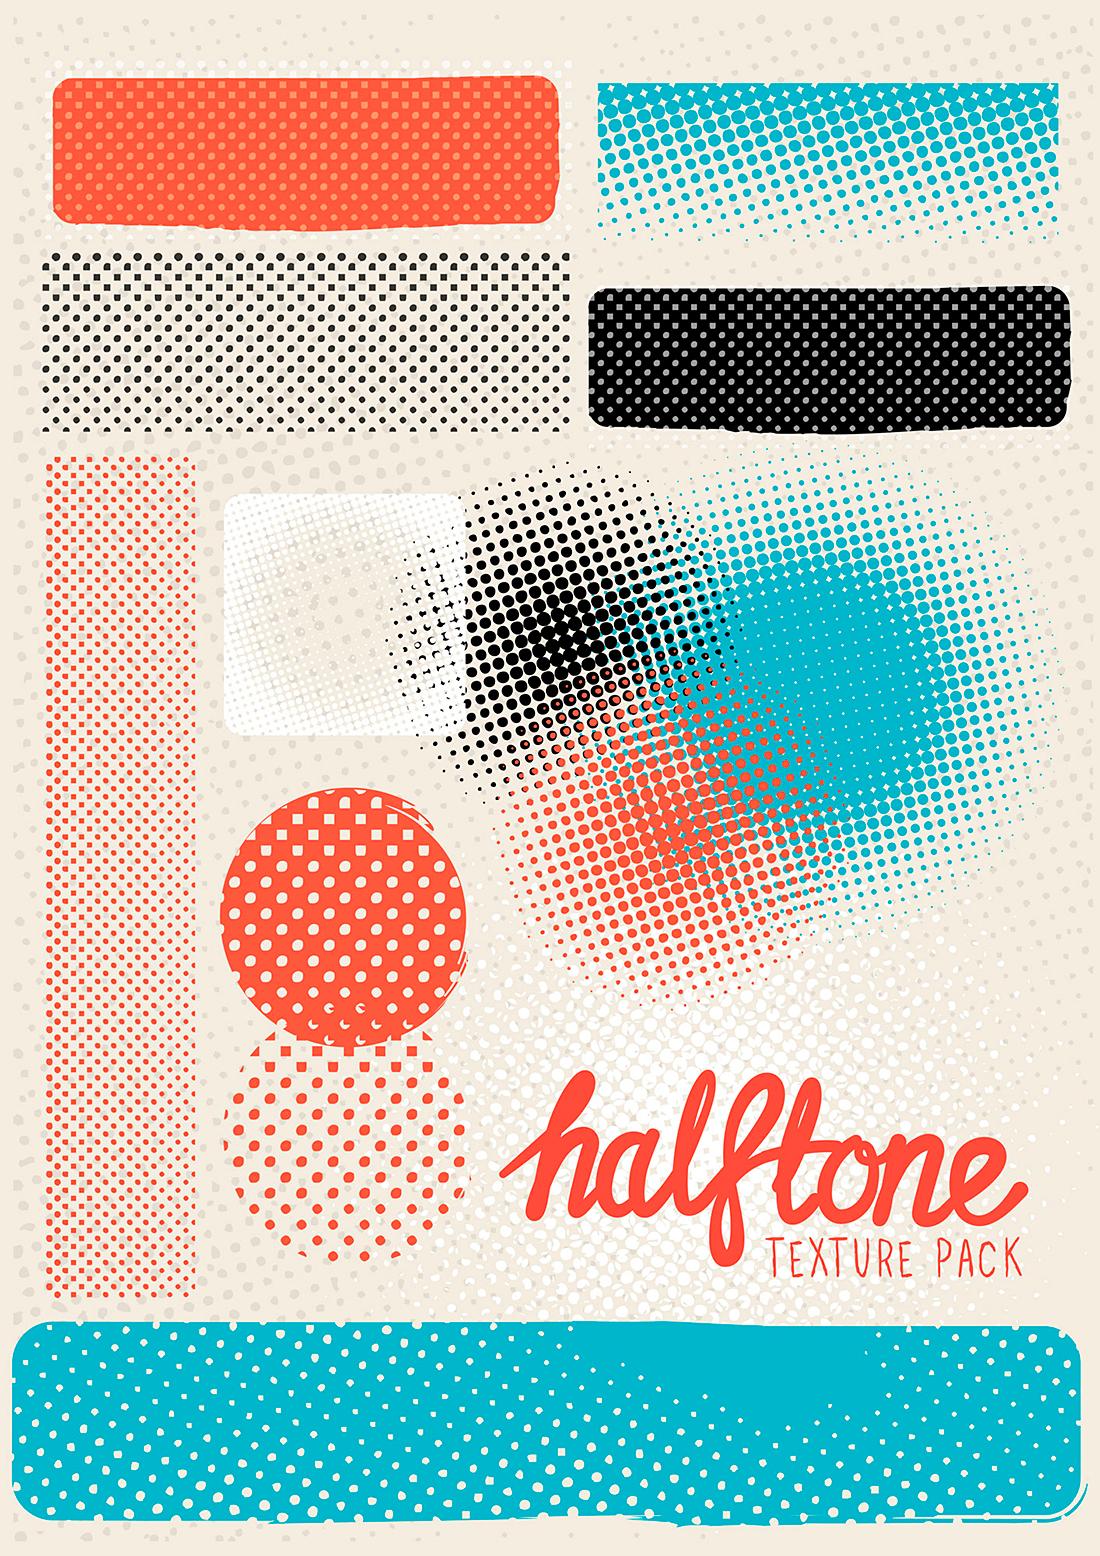 solarseven-halftone-texture-pack